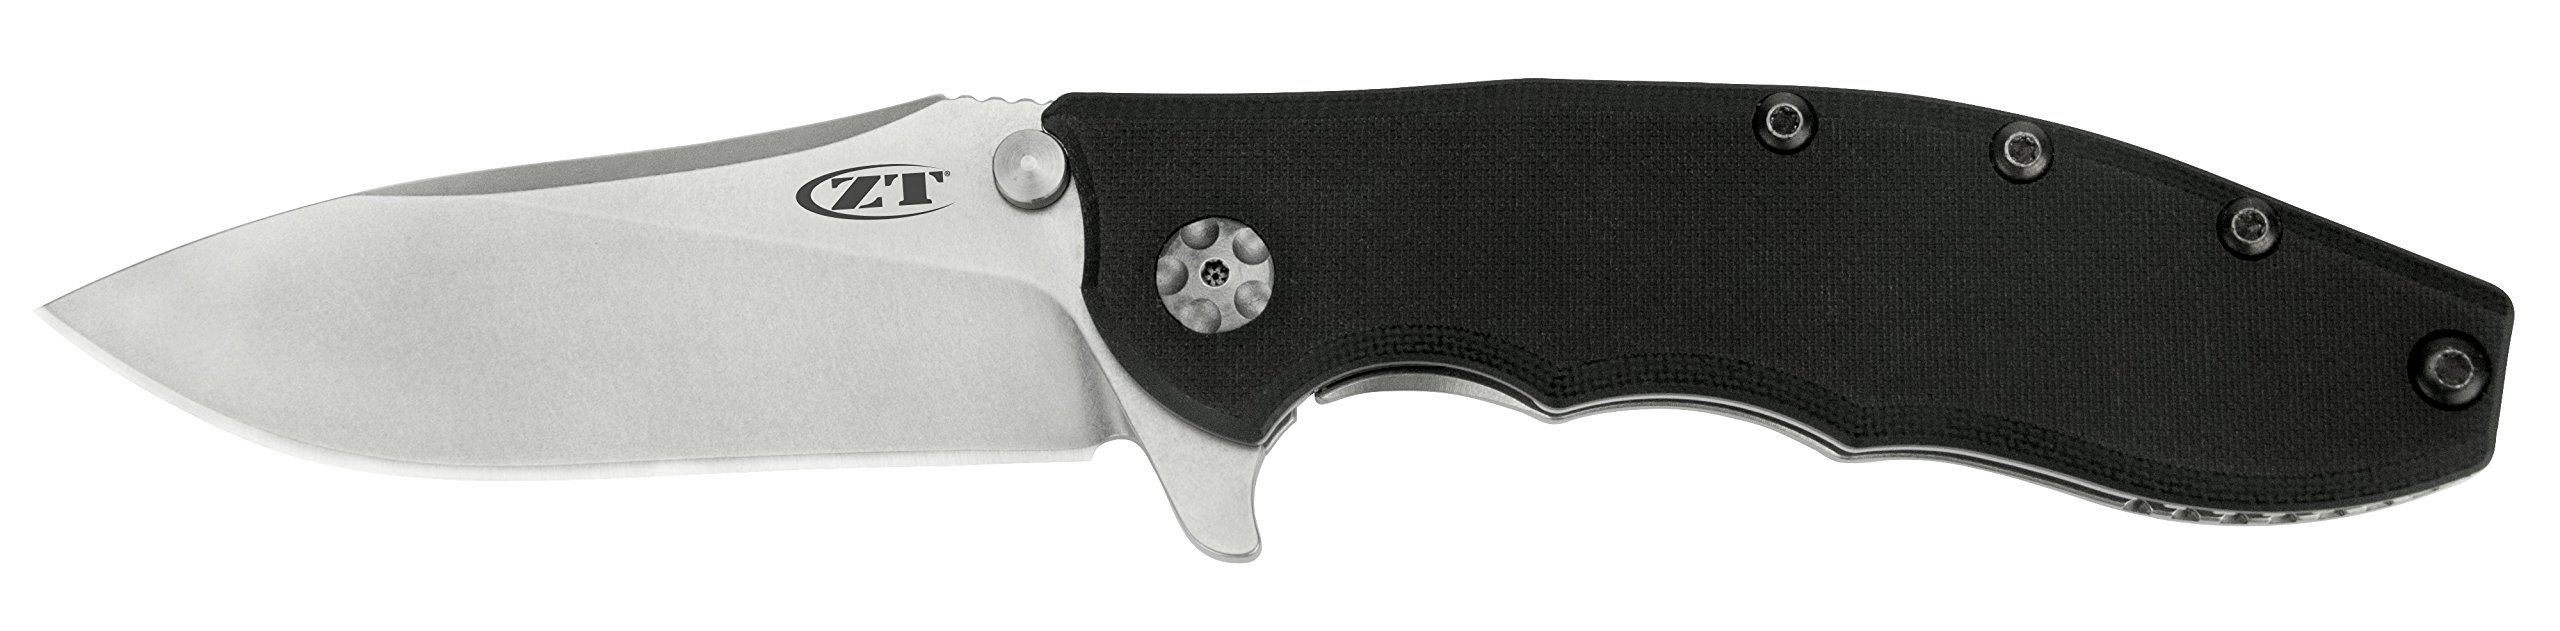 Zero Tolerance 0562 Hinderer Slicer Knife by Zero Tolerance